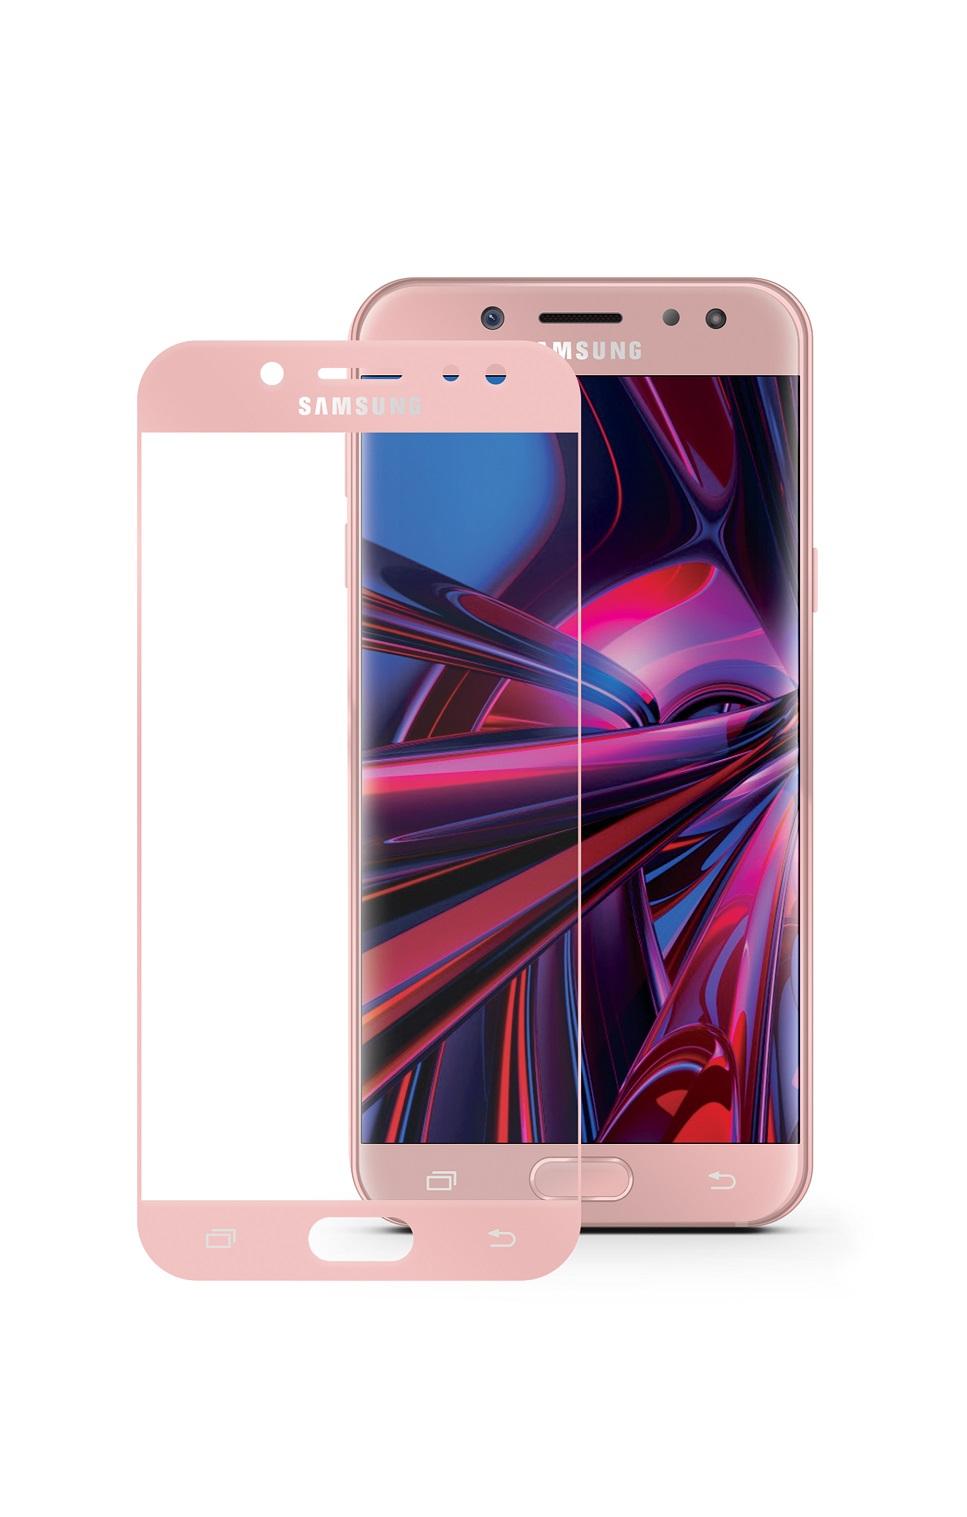 Защитное стекло Mobius Samsung J7 2017, розовый аксессуар защитное стекло для samsung galaxy j7 2017 mobius 3d full cover black